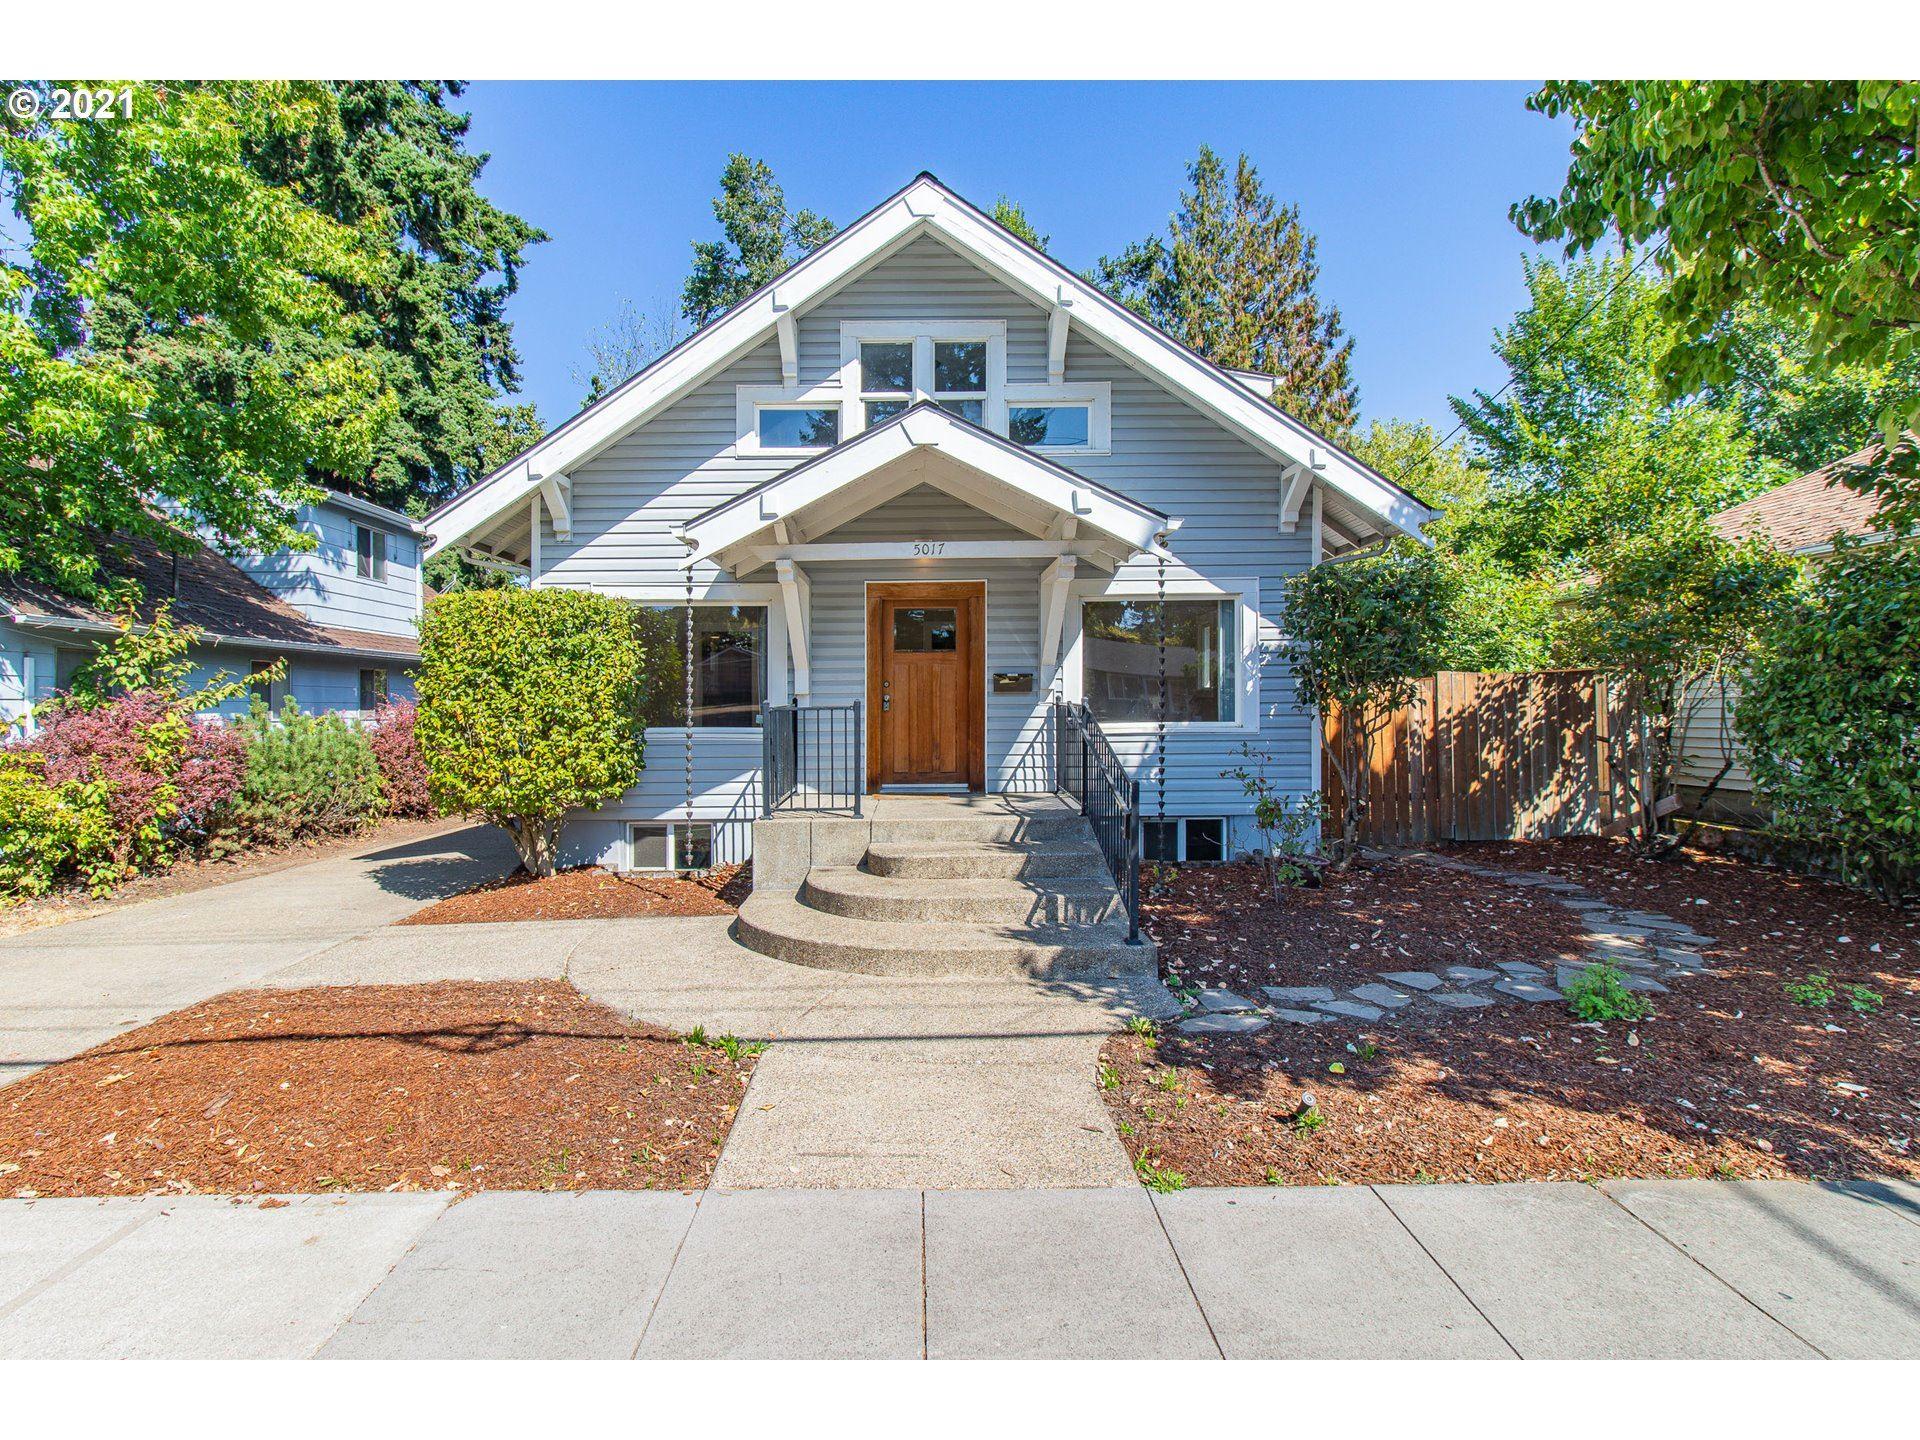 5017 SE WOODSTOCK BLVD, Portland, OR 97206 - MLS#: 21696902